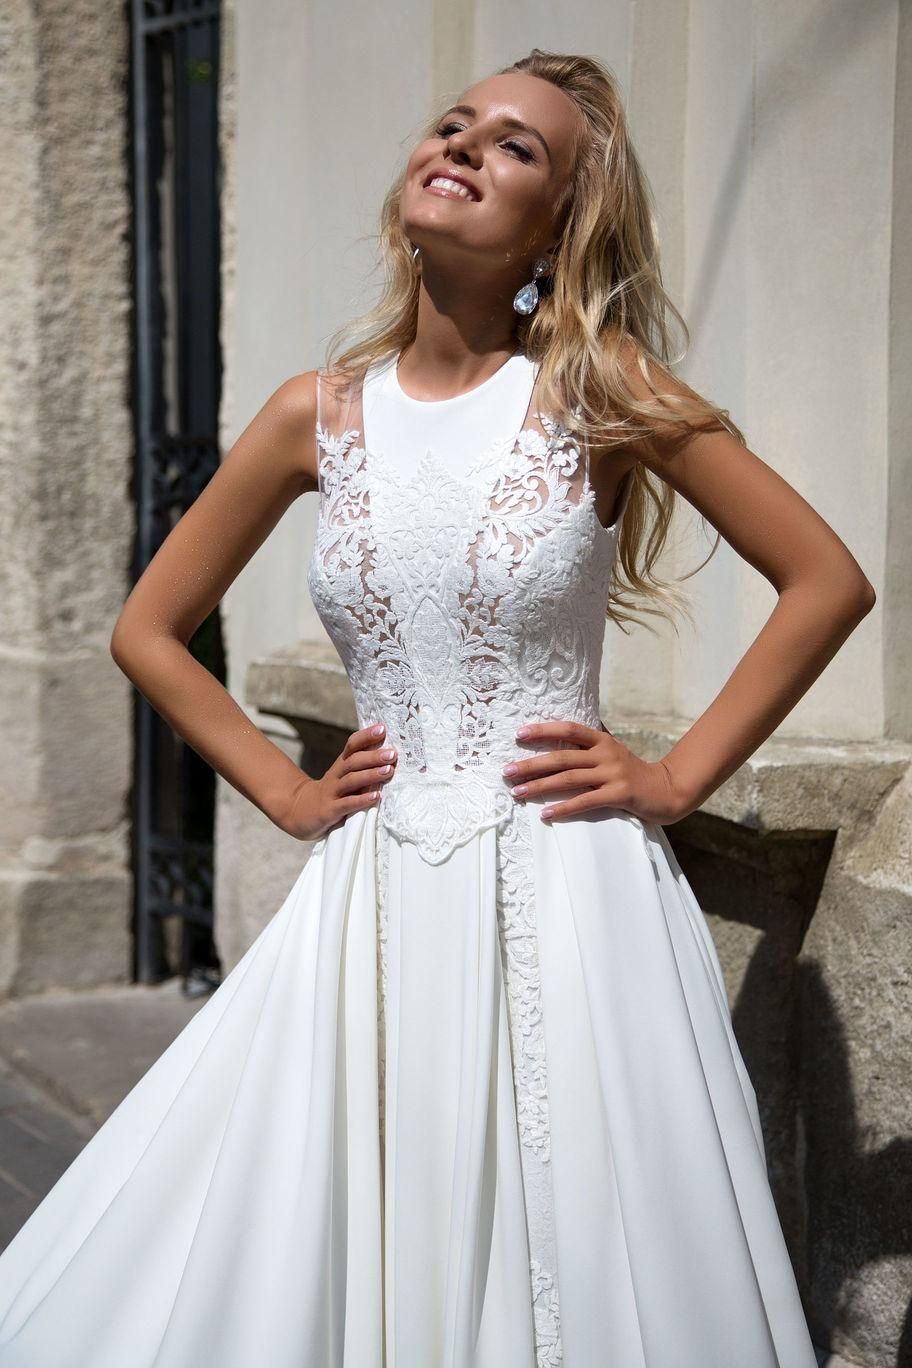 Wedding Dress By OKSANA MUKHA Designer In Charme Gaby Bridal Gown Boutique Tampa Bay FL